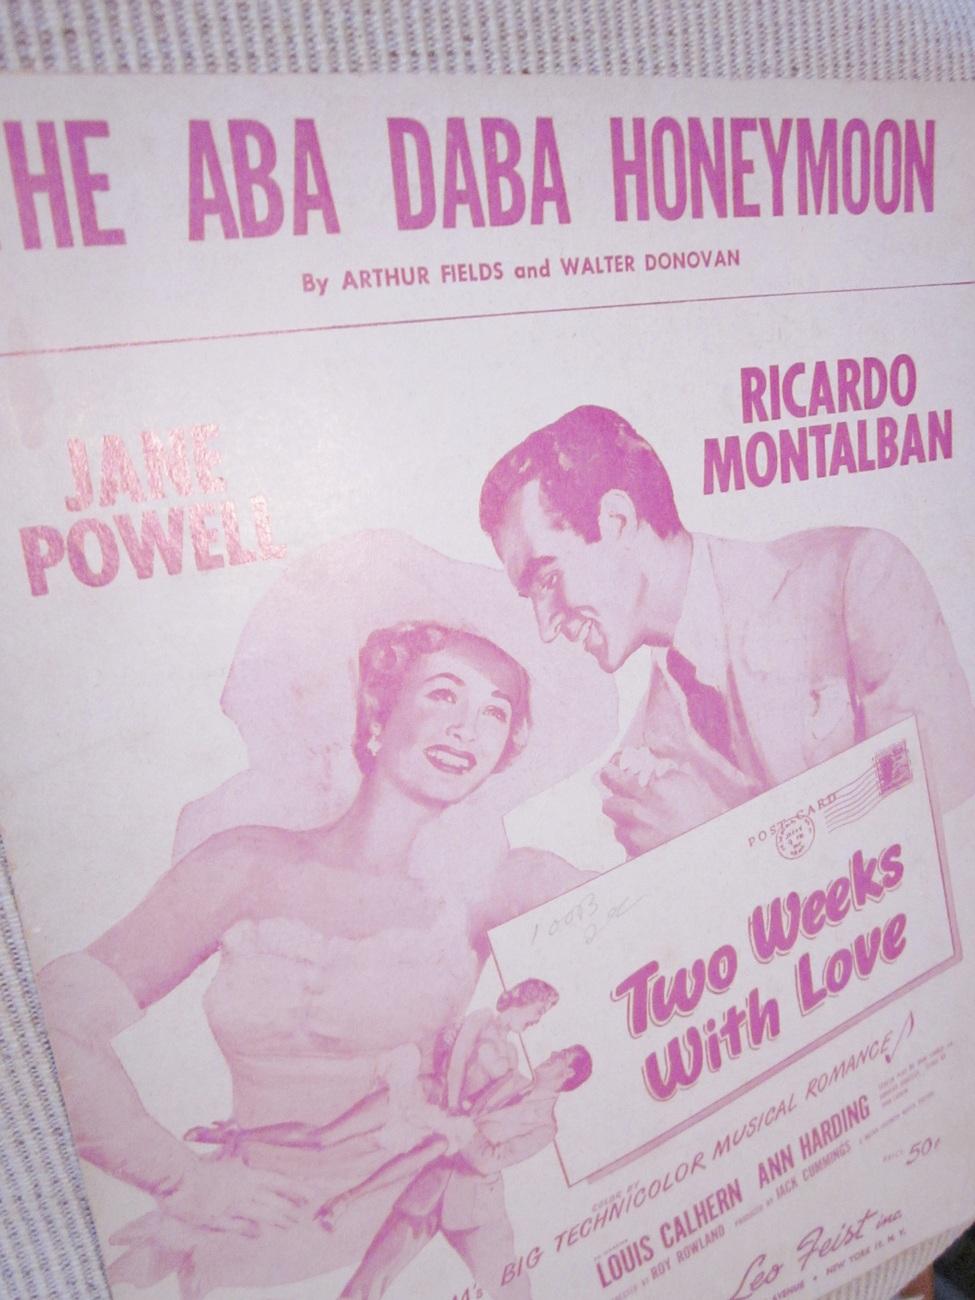 Vintage Sheet Music  The Aba Daba Honeymoon by Fields & Donovan